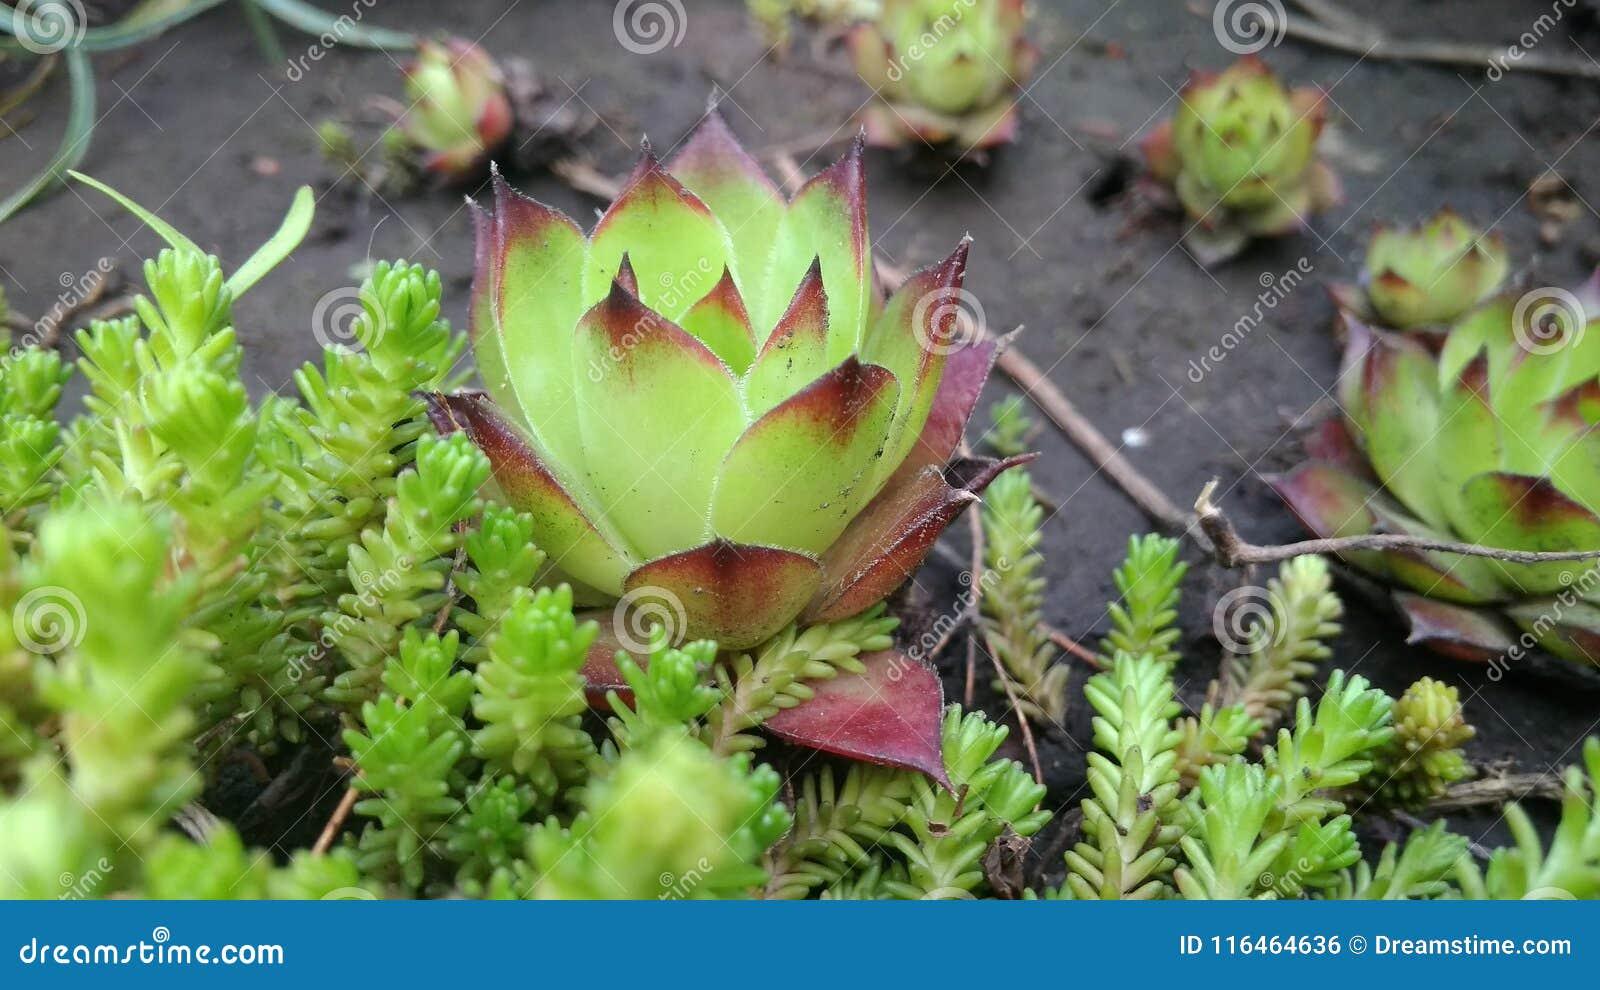 Sempervivum Houseleek In The Garden Stock Photo - Image of ... on birch plant, yarrow plant, scilla violacea plant, lemon balm plant, poppy plant, thyme plant, gold flower plant, hellebore plant, bottling plant, lady's mantle plant, sage plant, holly plant, perennial plant, hyssop plant, daffodil plant, lemon verbena plant, goat's beard plant, hops plant, catmint plant,